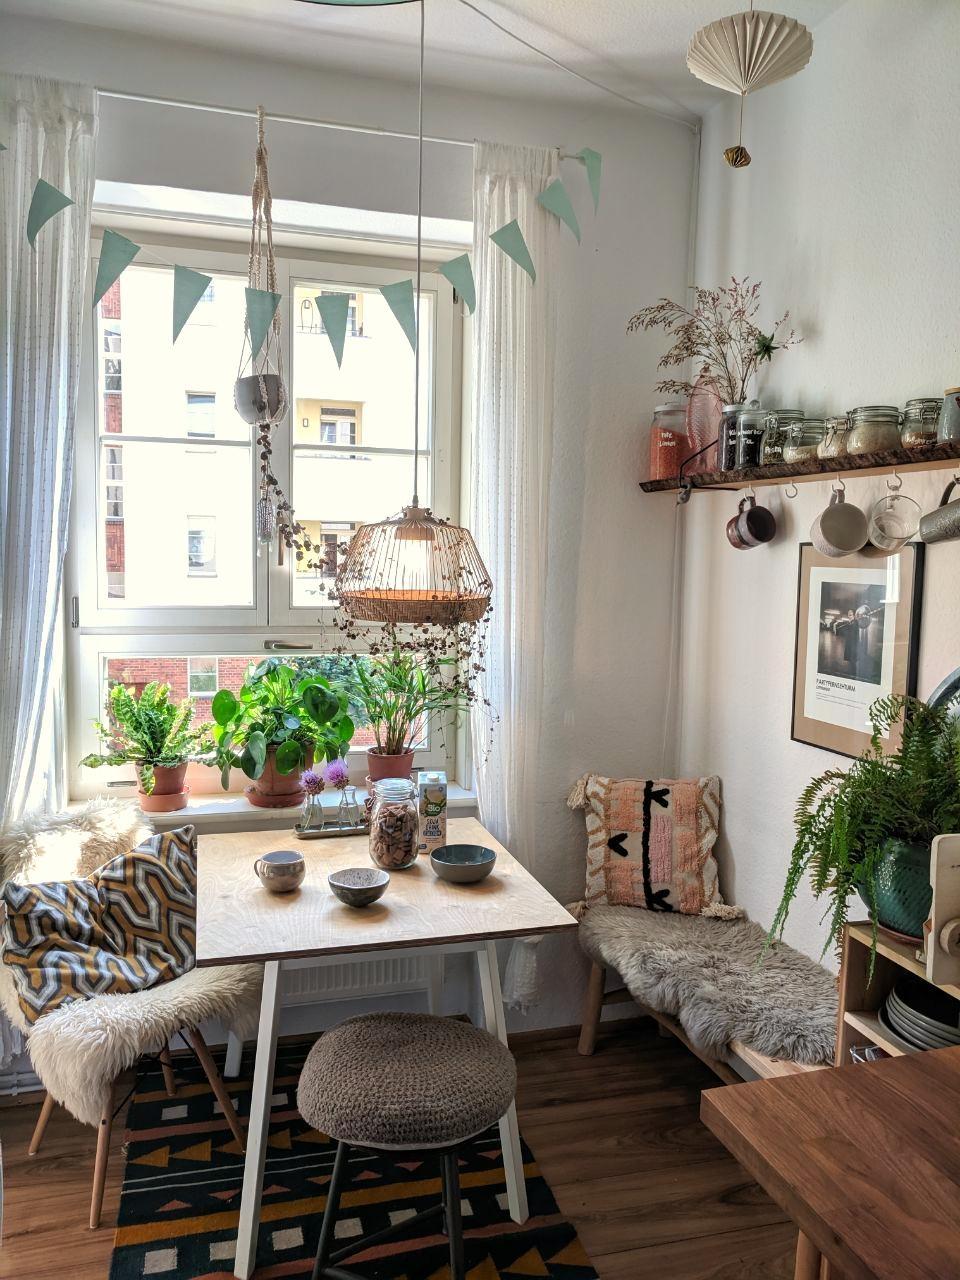 kleineküche  breakfast  coffeetable